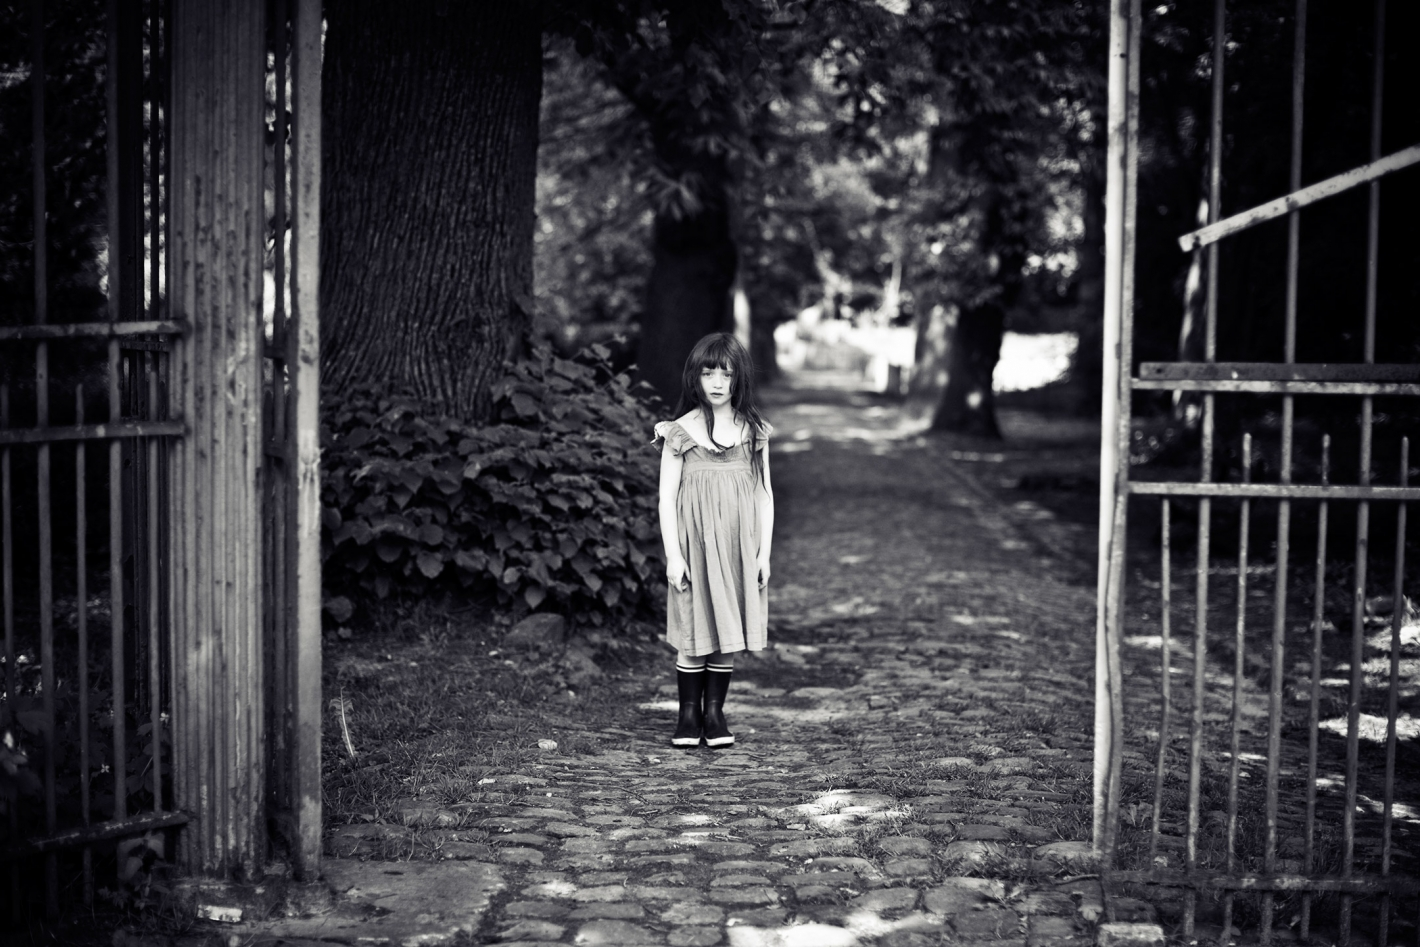 LENA_7030_L_Bazzoni